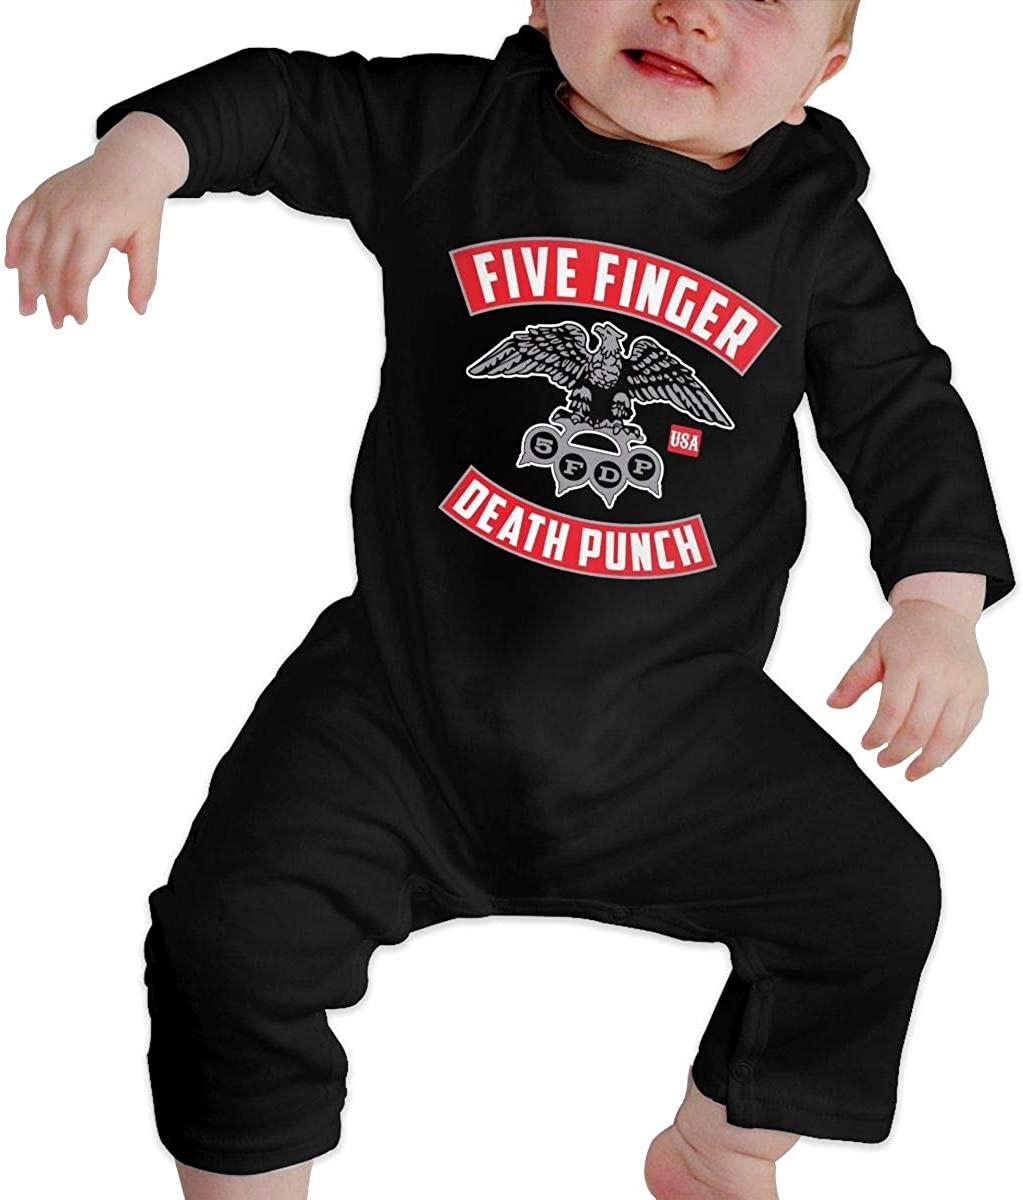 Qq1-asd-store Five Finger Death Punch Boys/Girls Baby Cotton Long Sleeve Romper Warm Bodysuit